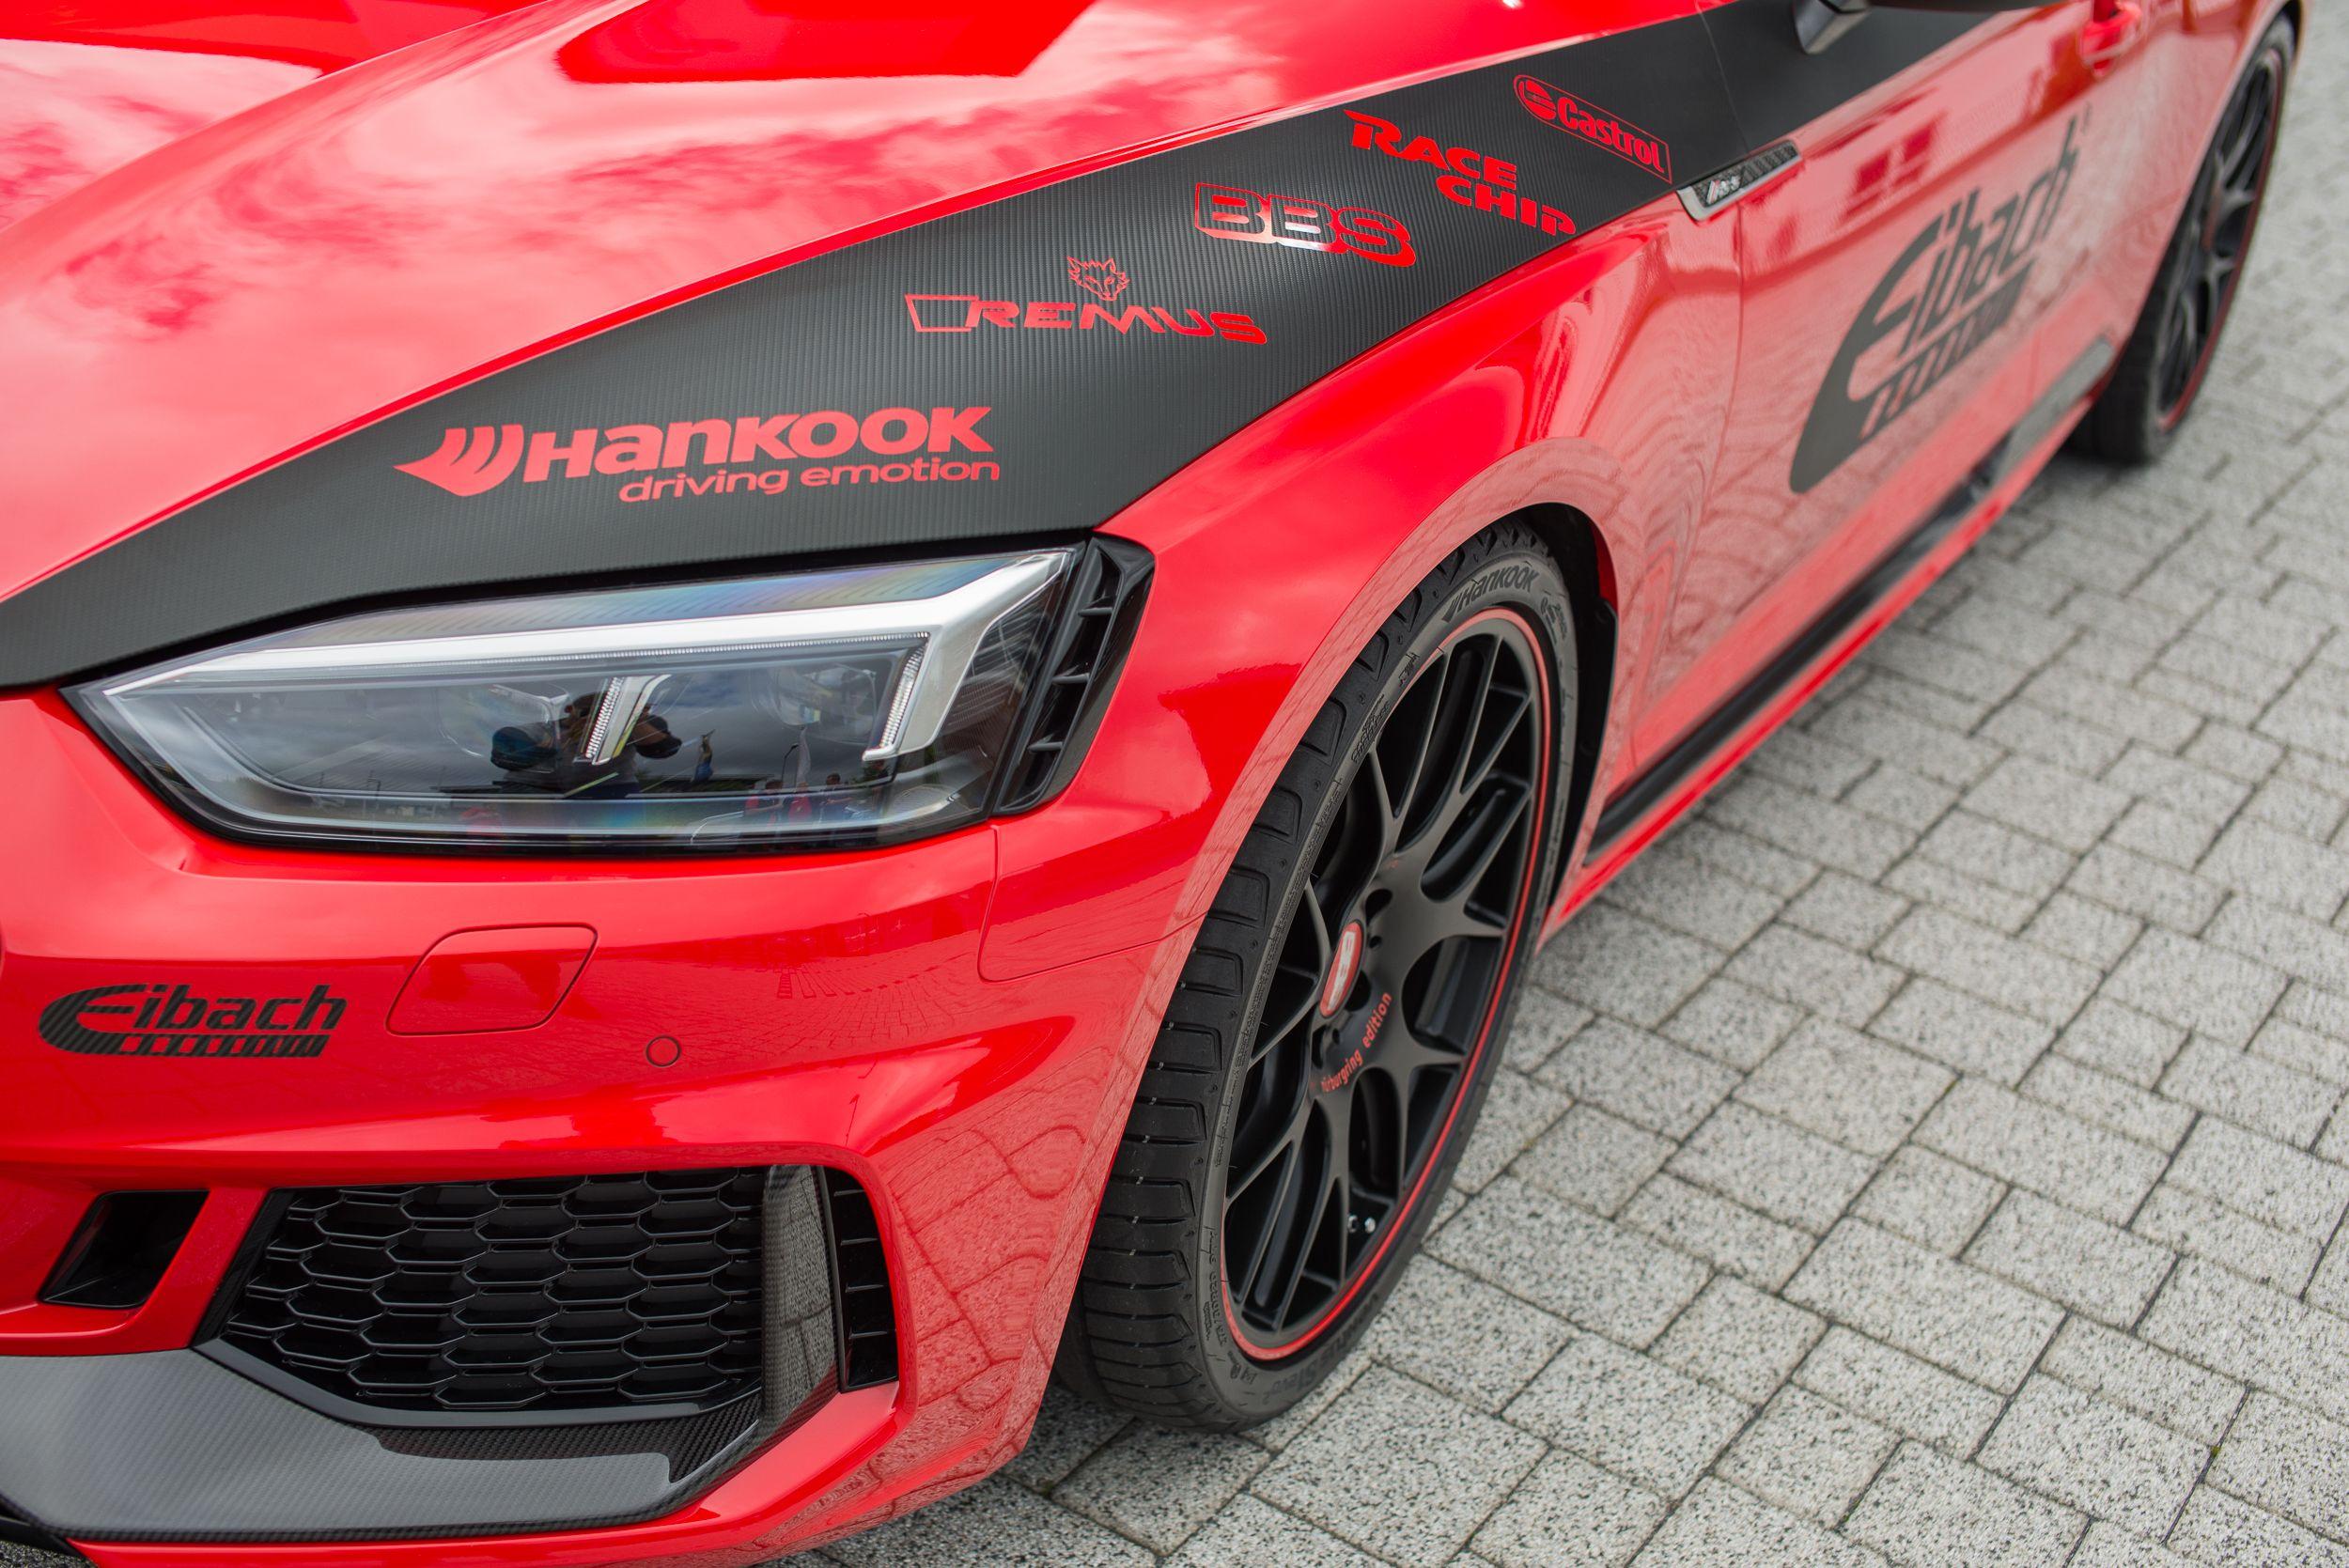 Audi Rs5 Coupe 2017 Felgen Tuning A La Eibach Audi Rs5 Audi